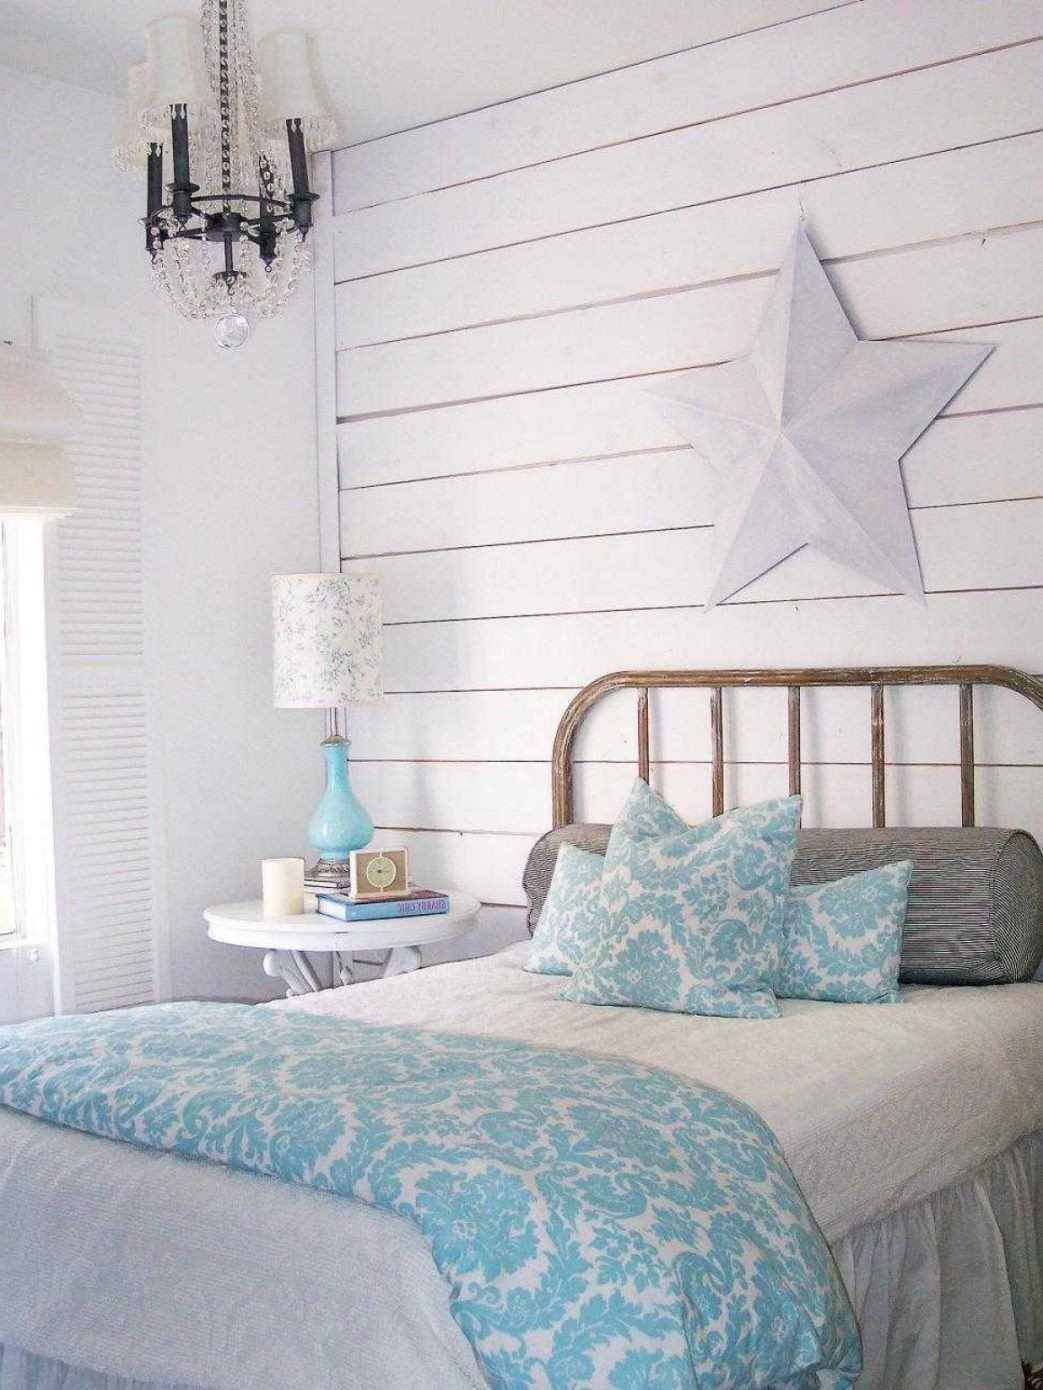 Beach theme Bedroom Decor Inspirational 26 Divine Shabby Chic Colors Ideas